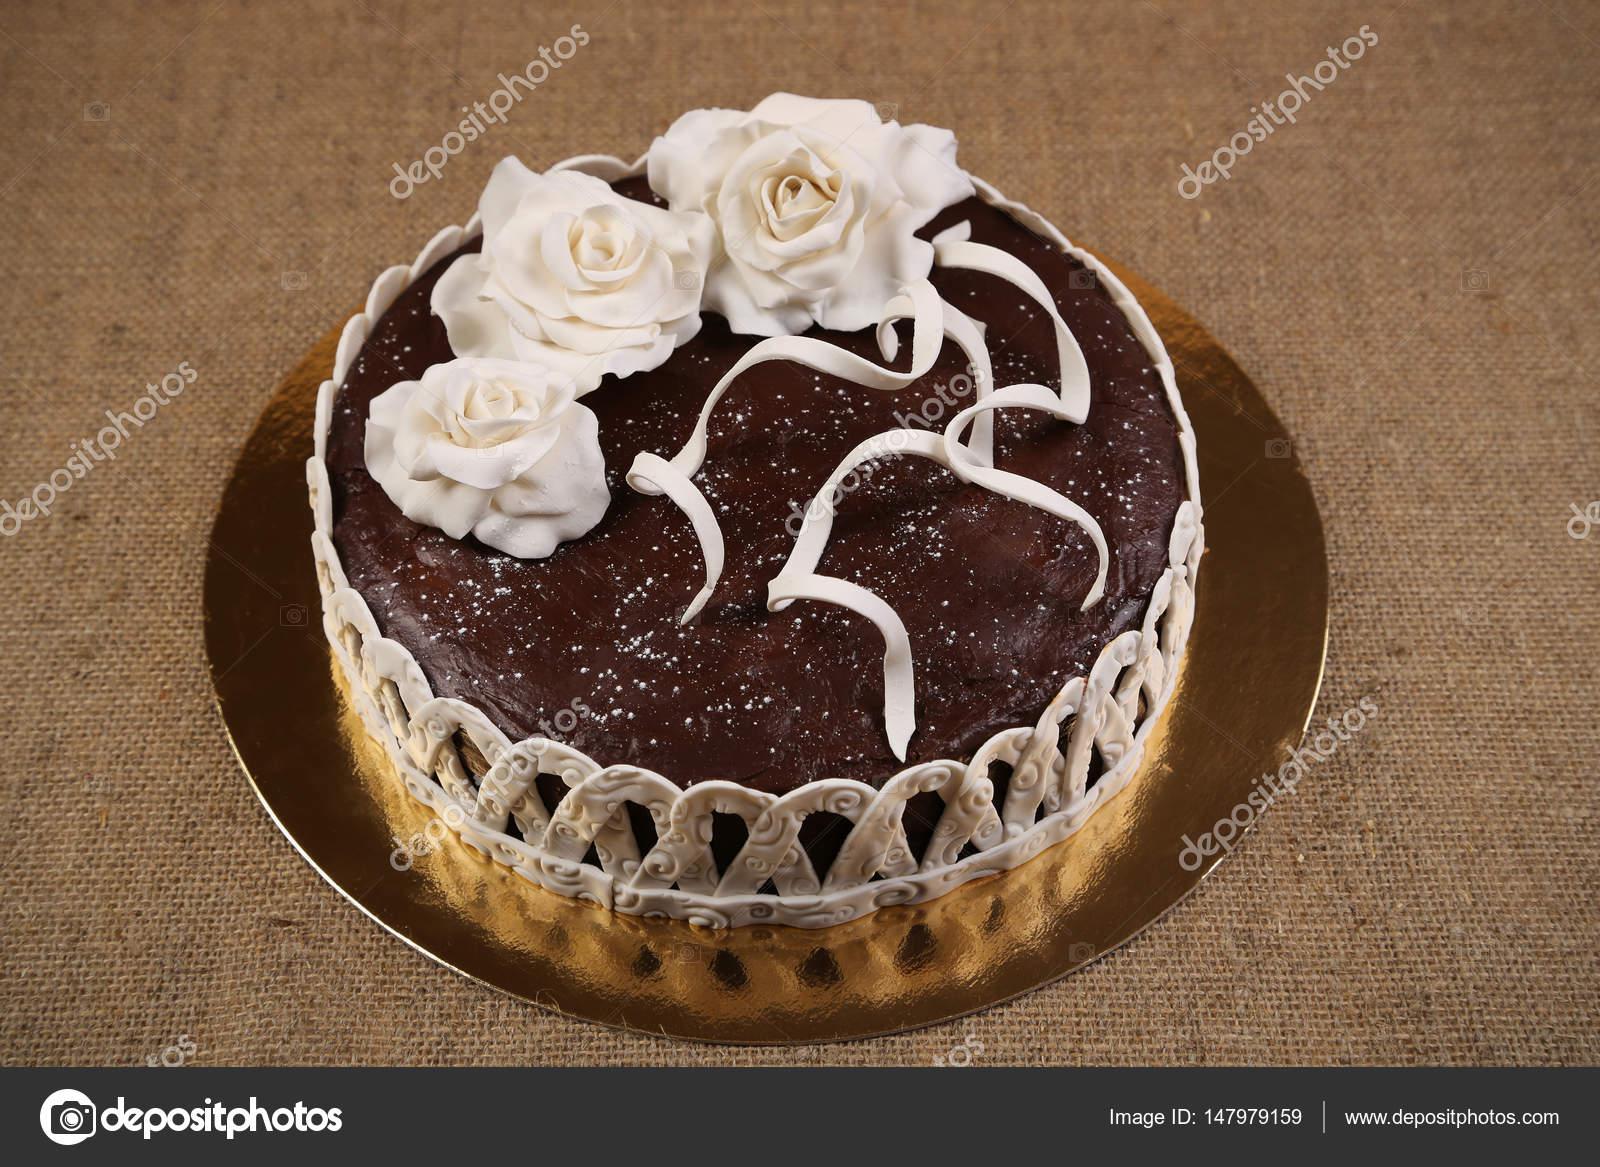 Chocolate cake decorated white fondant flowers stock photo volke chocolate cake decorated white fondant flowers stock photo mightylinksfo